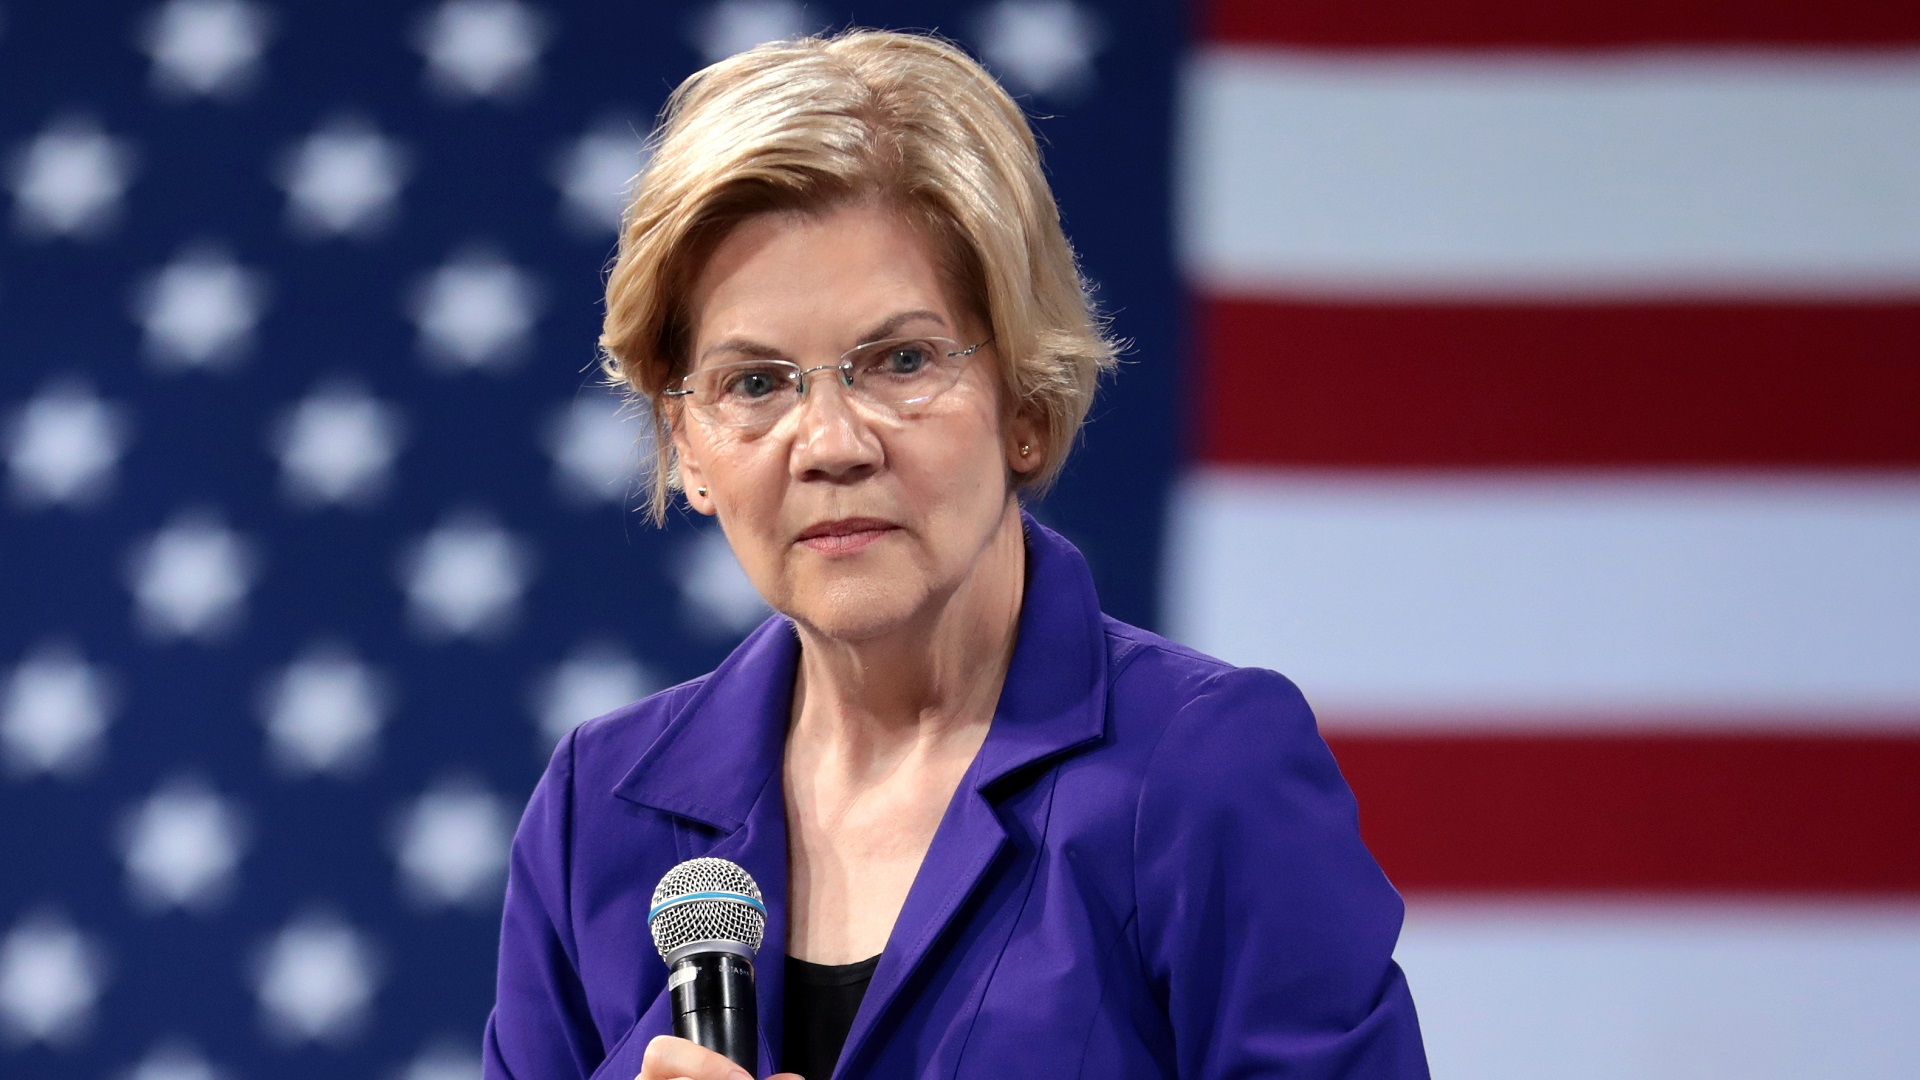 Elizabeth Warren endorses Trump's economic war on Venezuela, then soft-pedals far-right Bolivia coup | The Grayzone